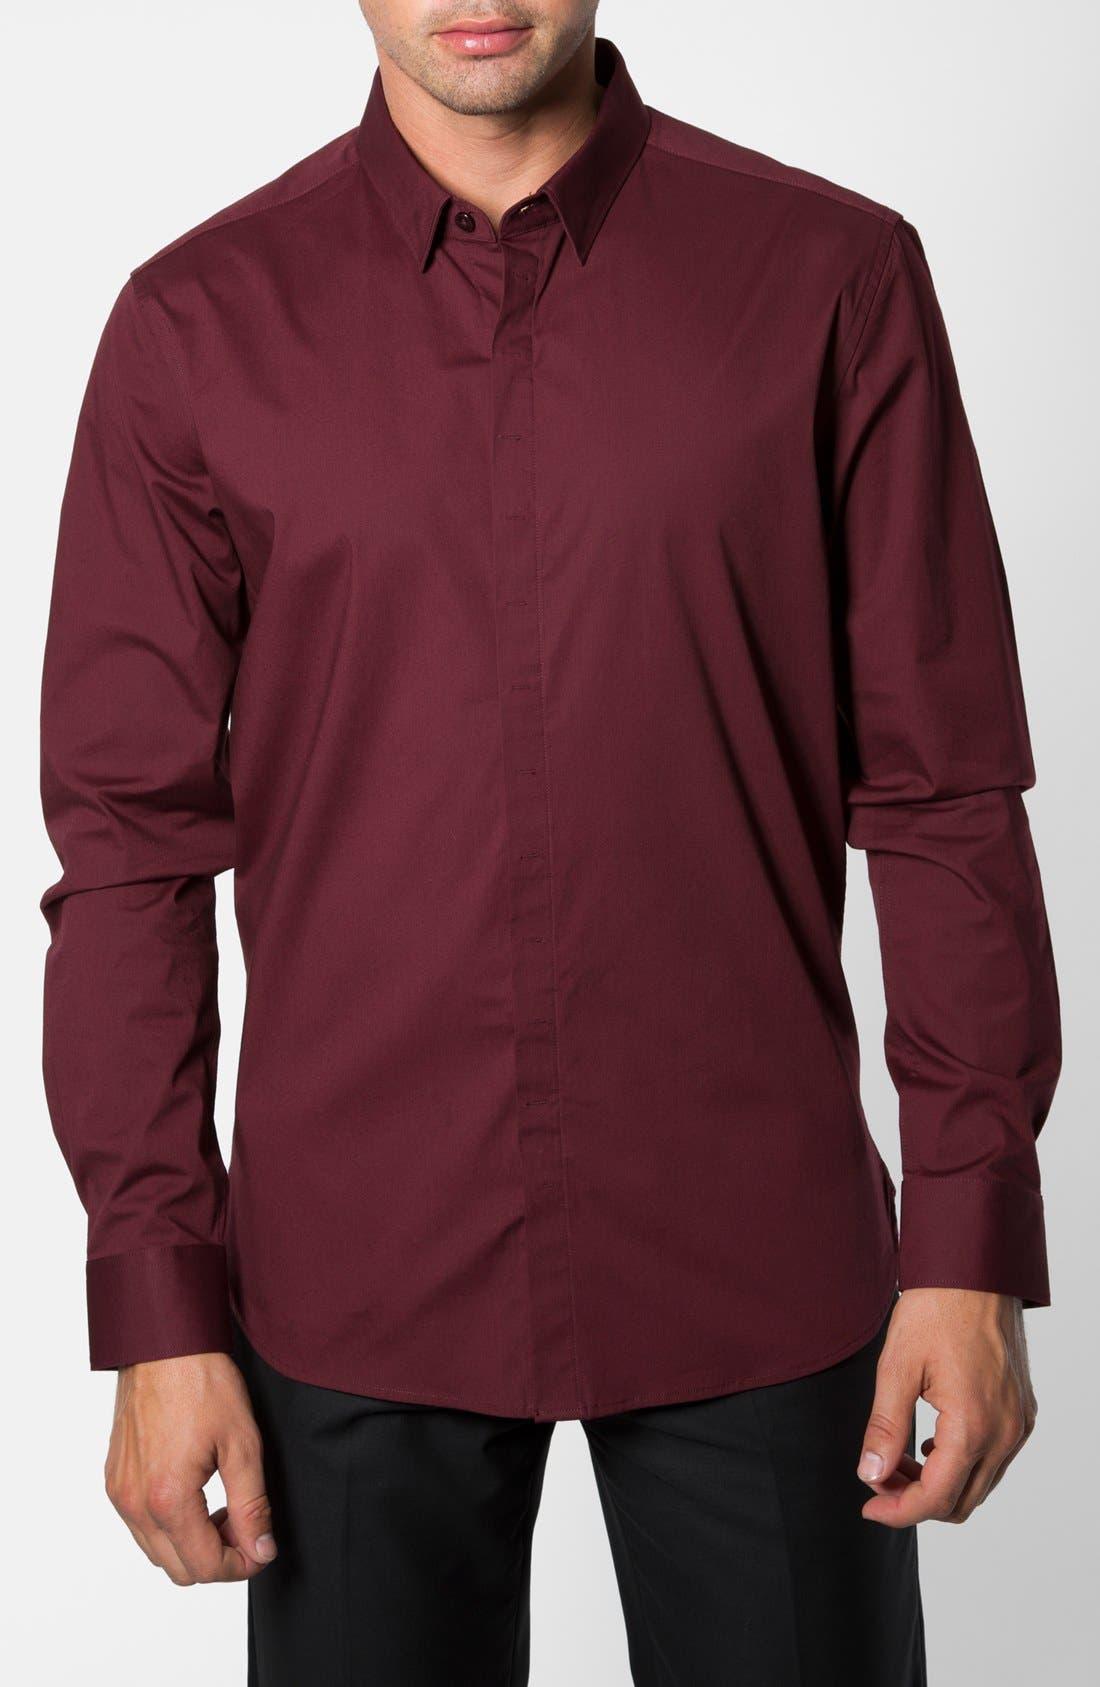 'Peace Train' Trim Fit Woven Shirt,                             Main thumbnail 5, color,